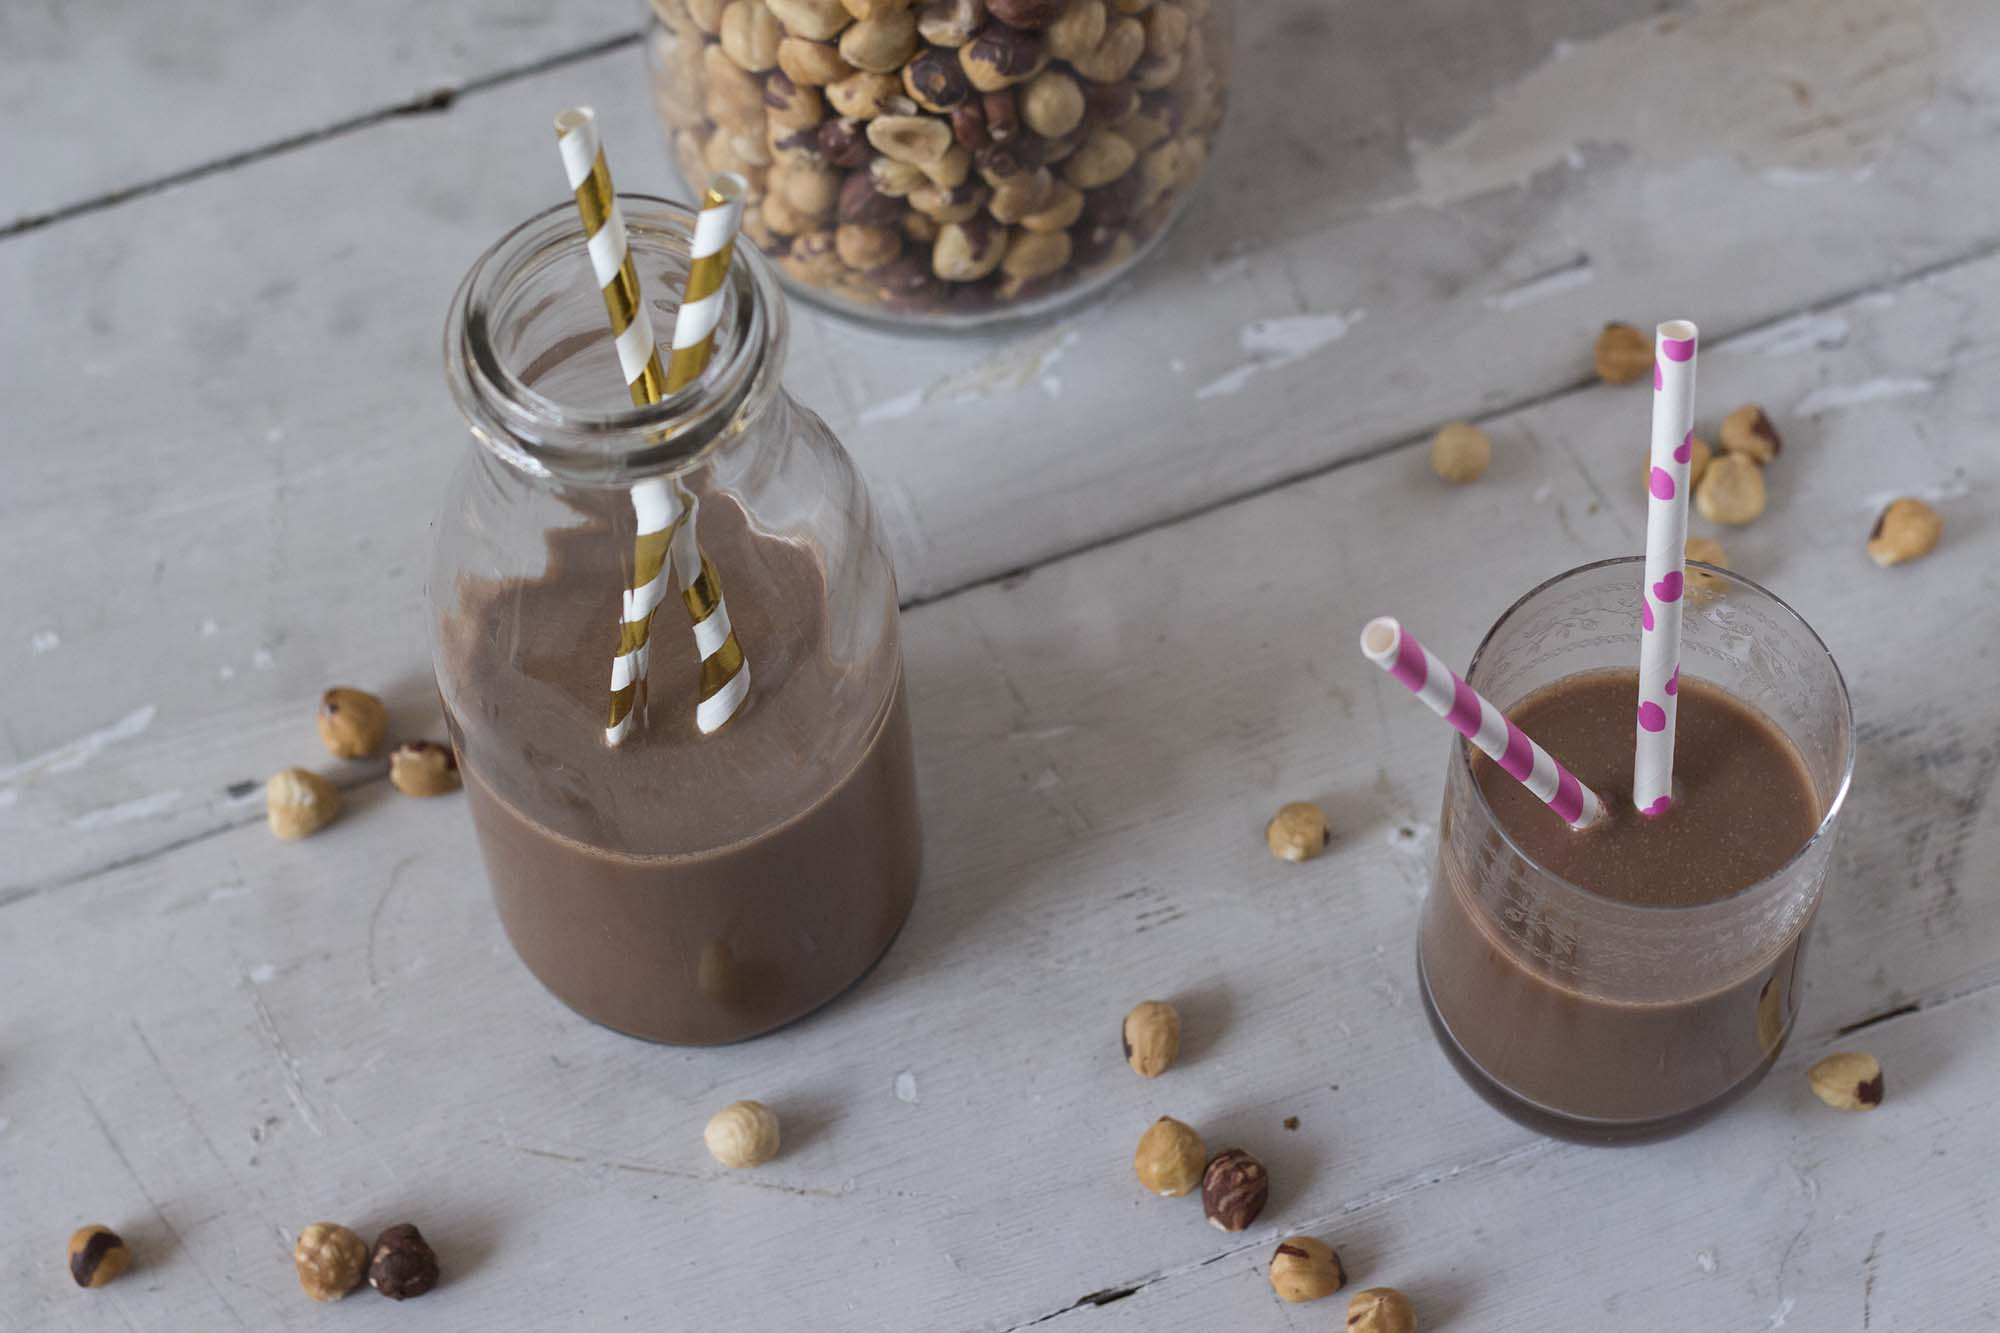 Nutella-mælk